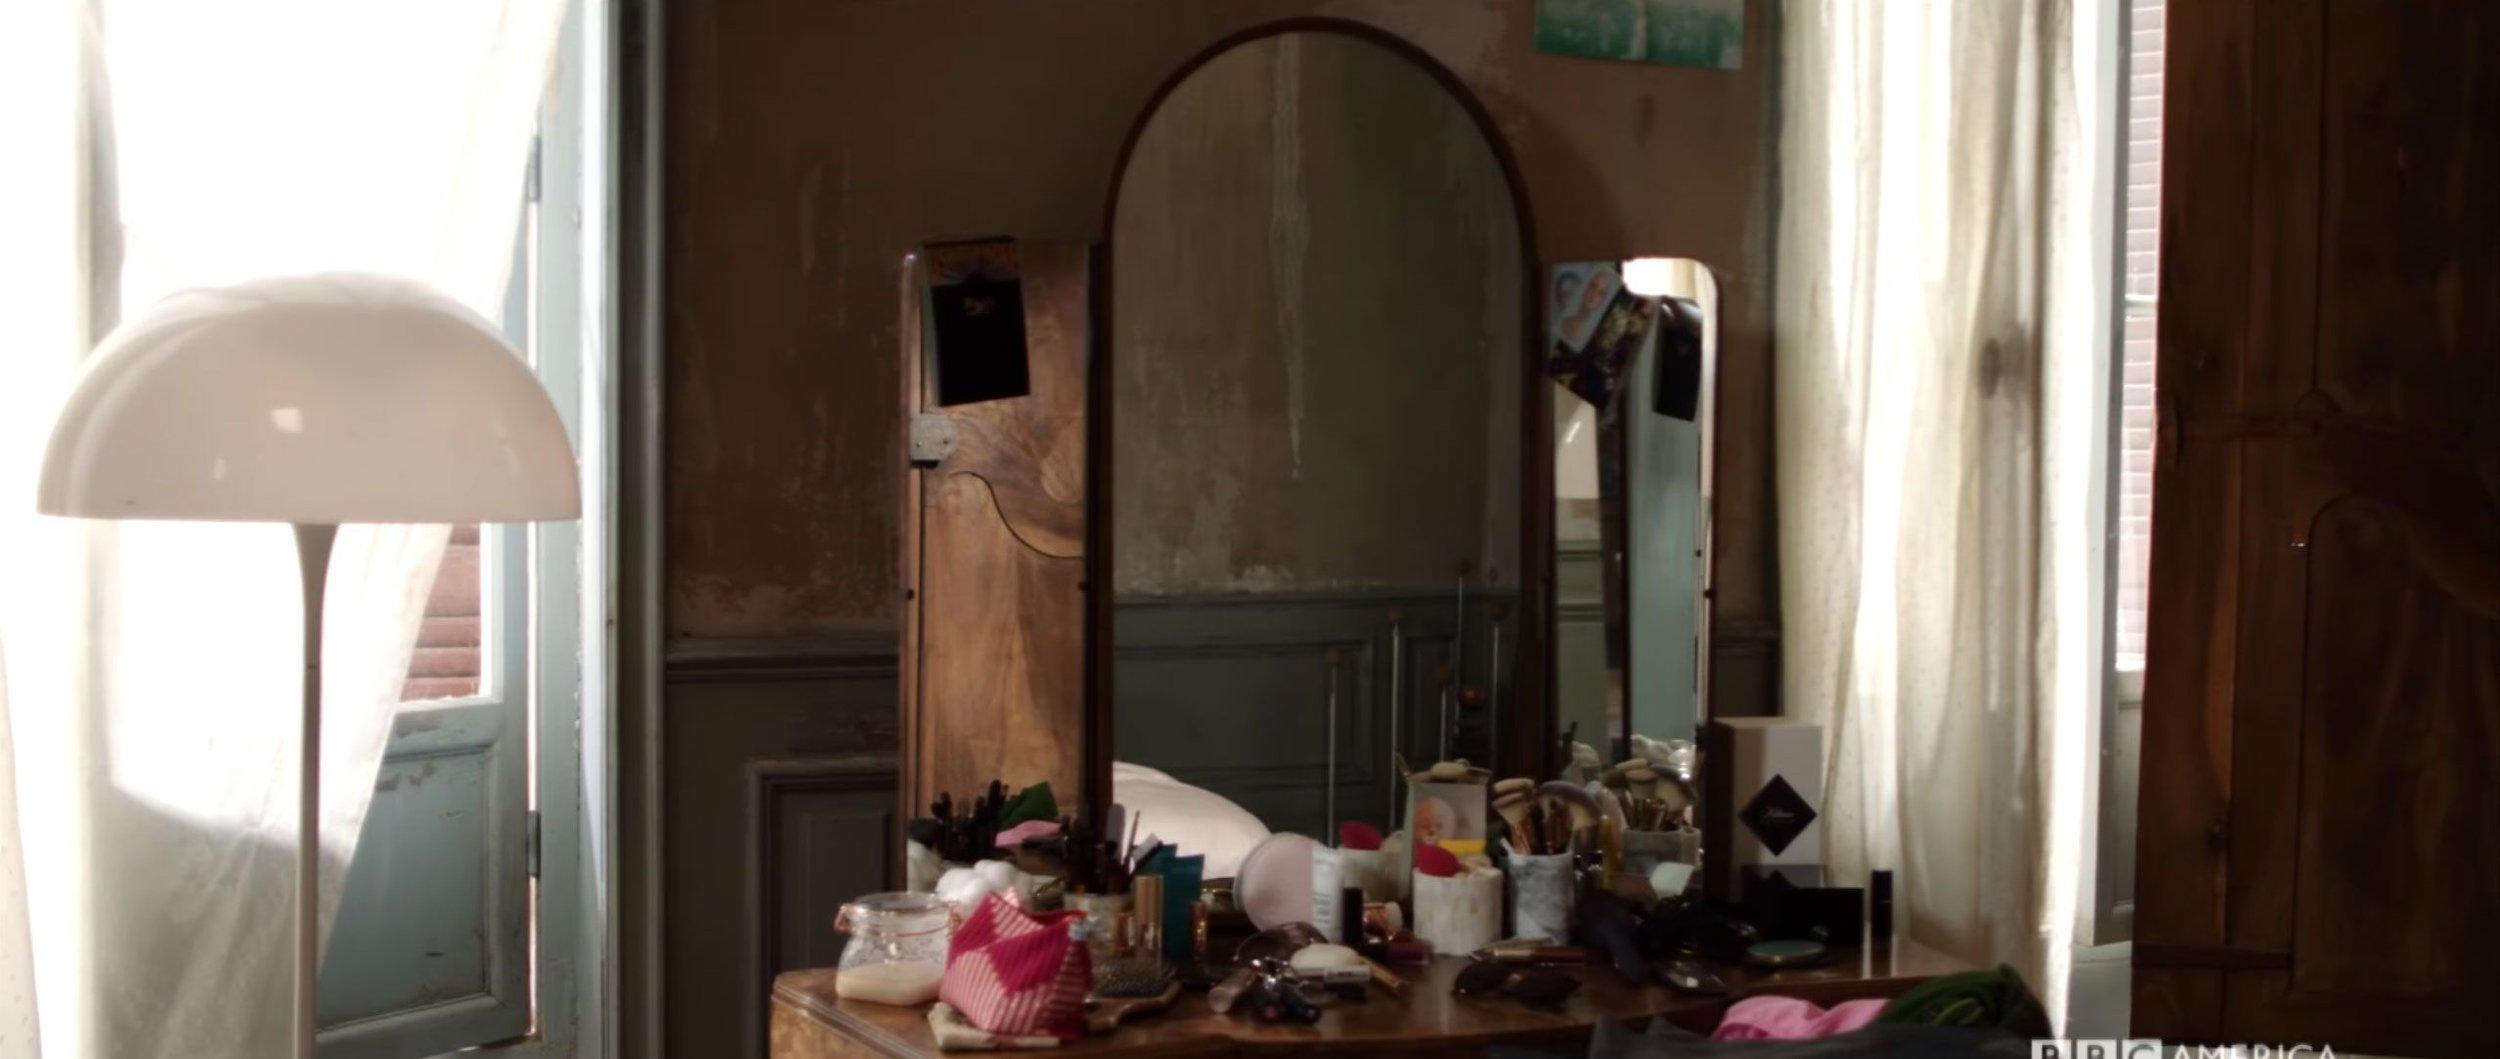 villanelles-parisian-apartment-in-emkilling-2031242.jpg